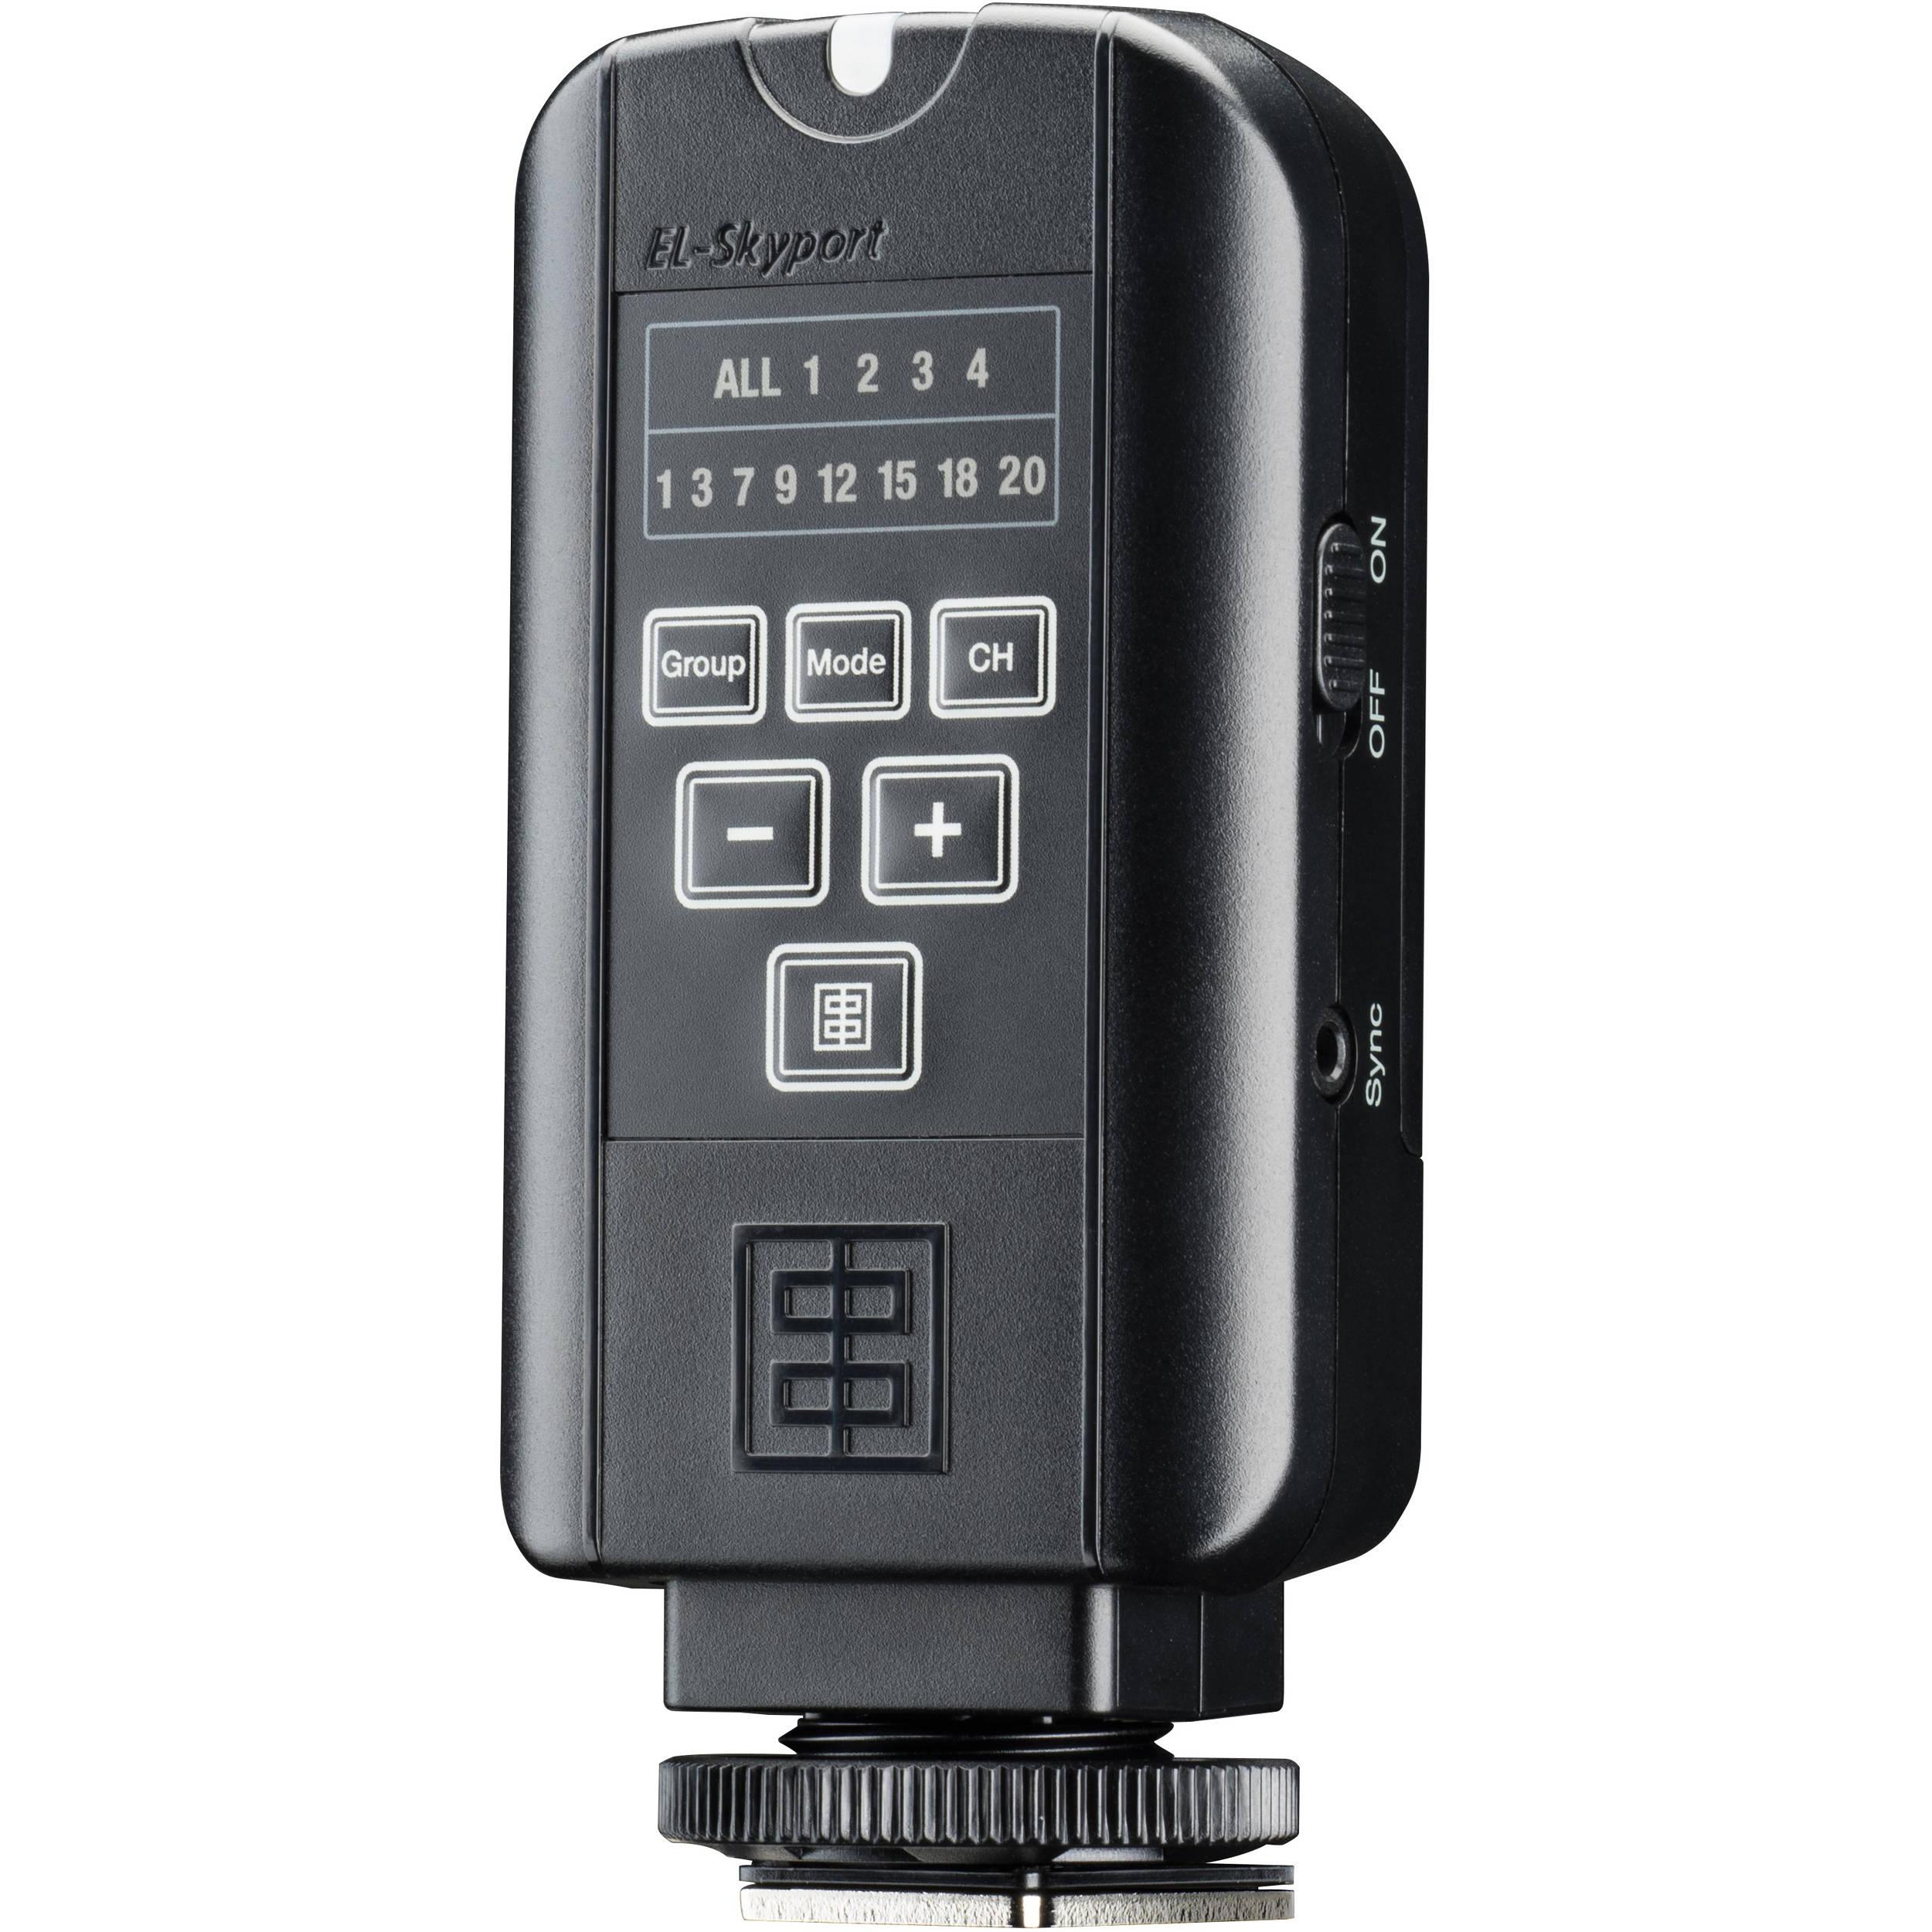 Elinchrom EL-Skyport Transmitter Plus #EL19368 Camera Flash Trigger ELSP-T